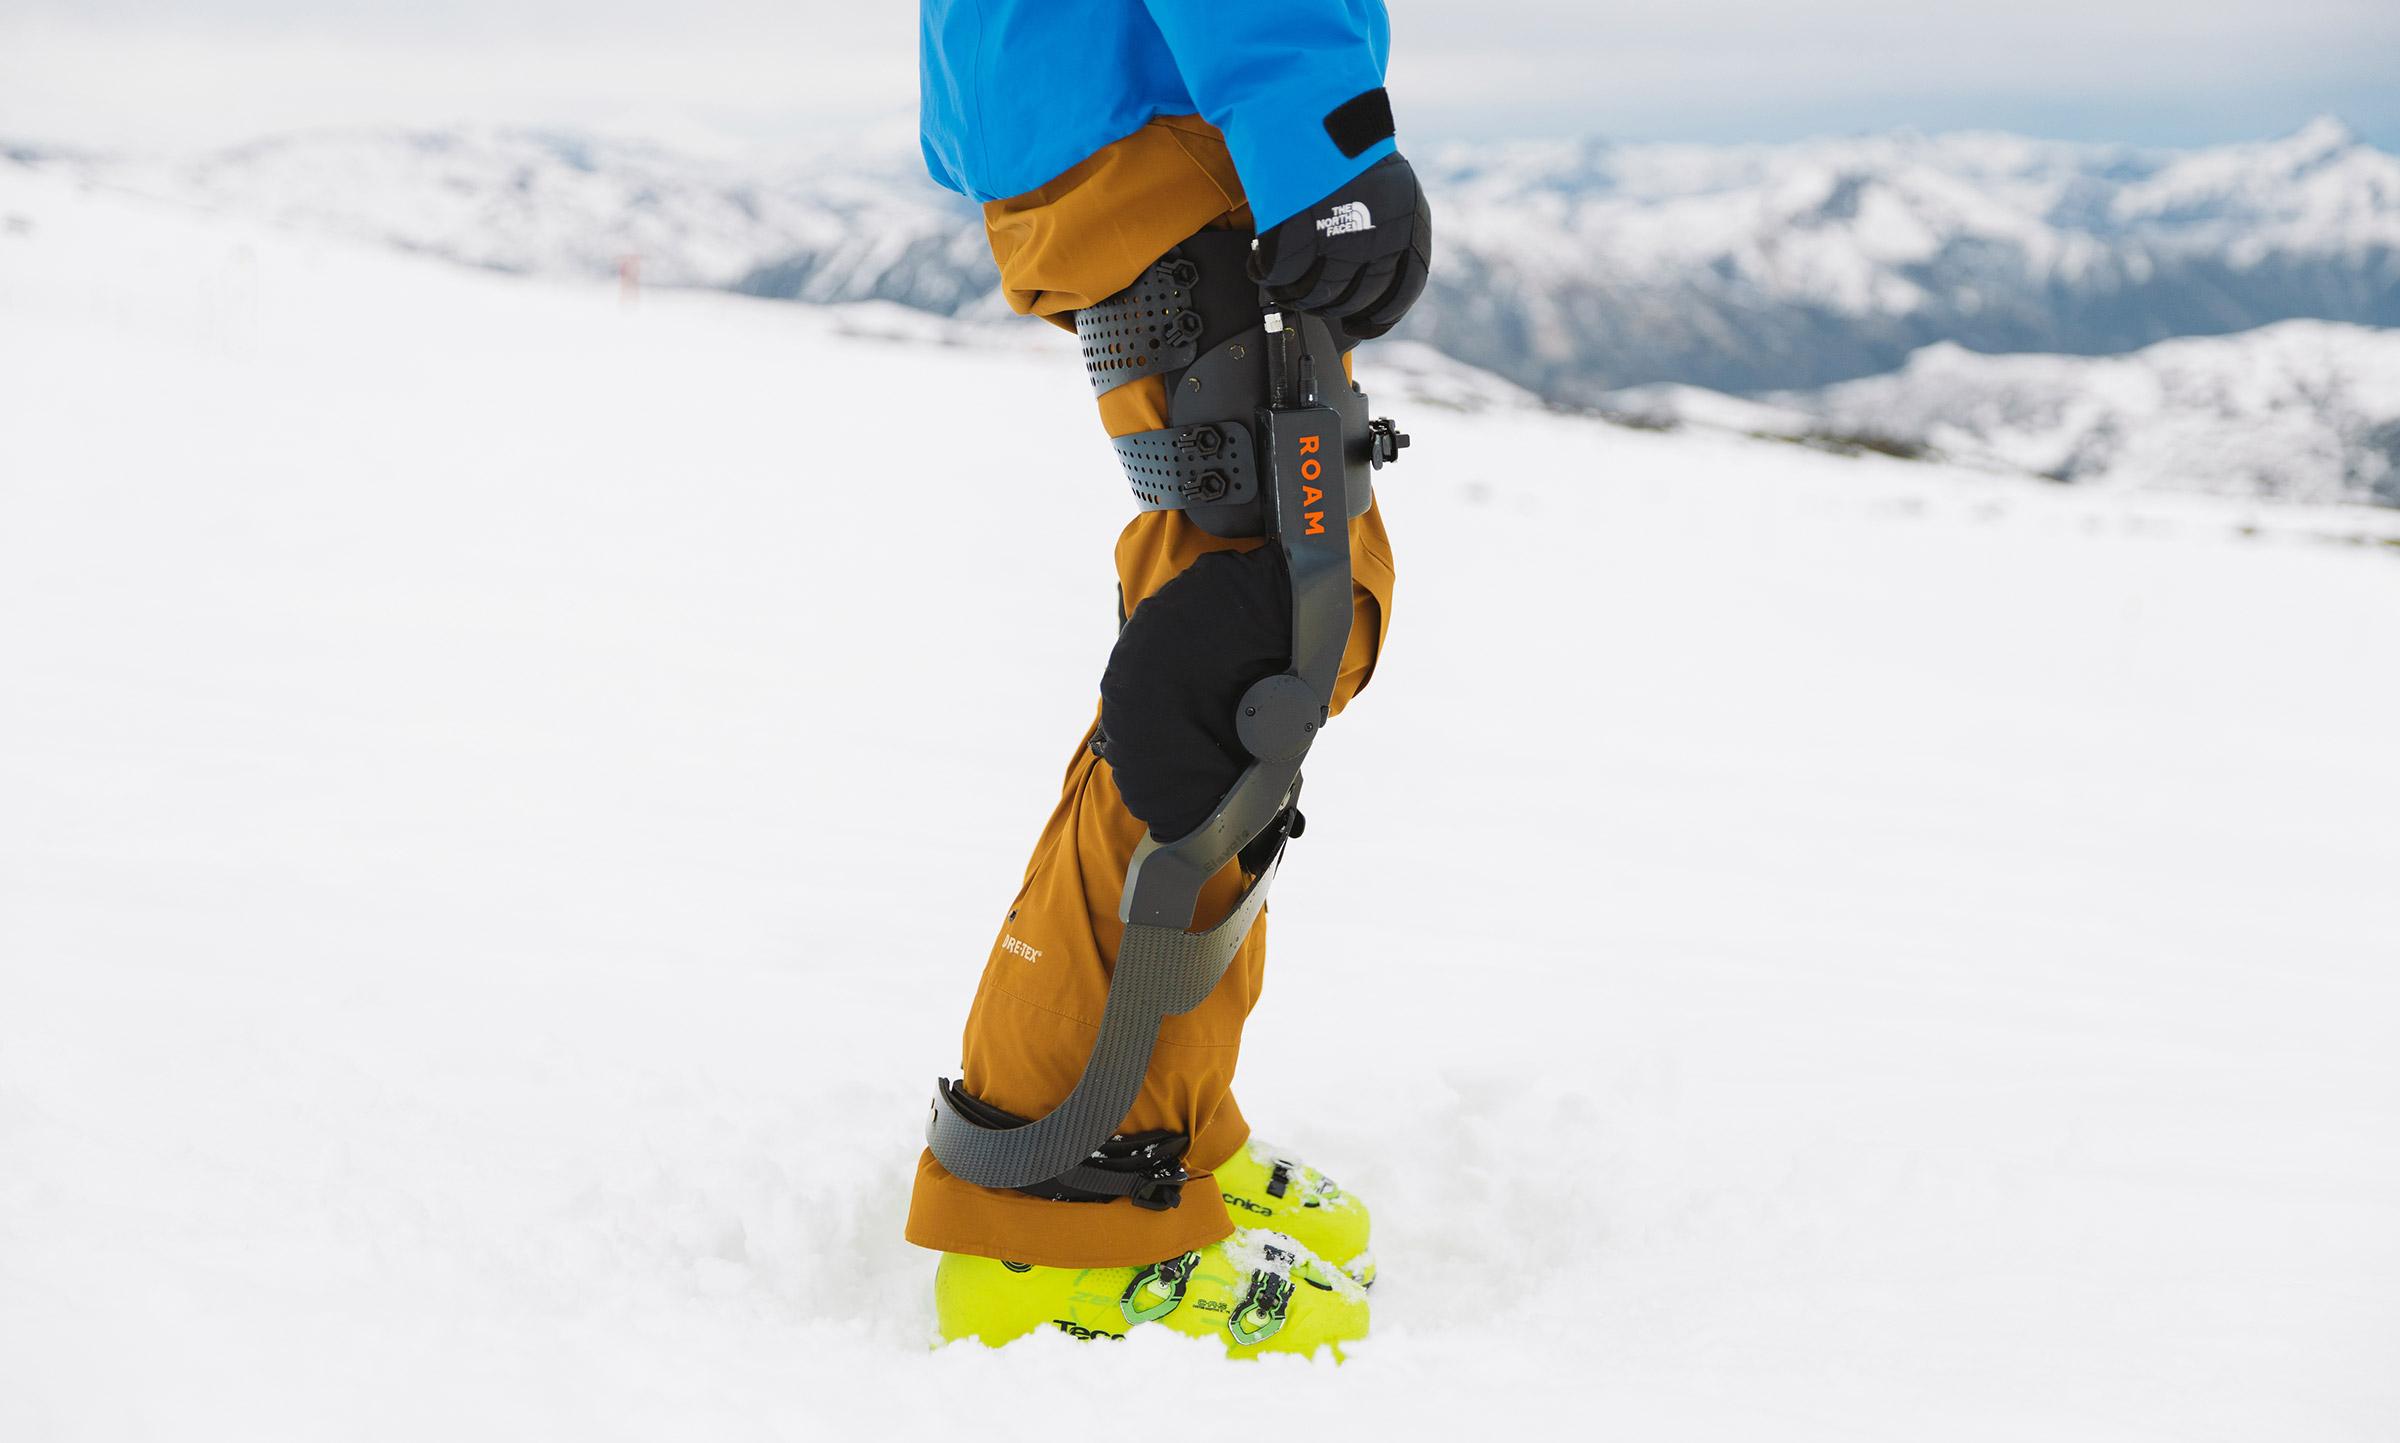 Roam Robotics Elevate Robotic Ski Exoskeleton: Special Mention on Best Inventions 2019 | Time.com